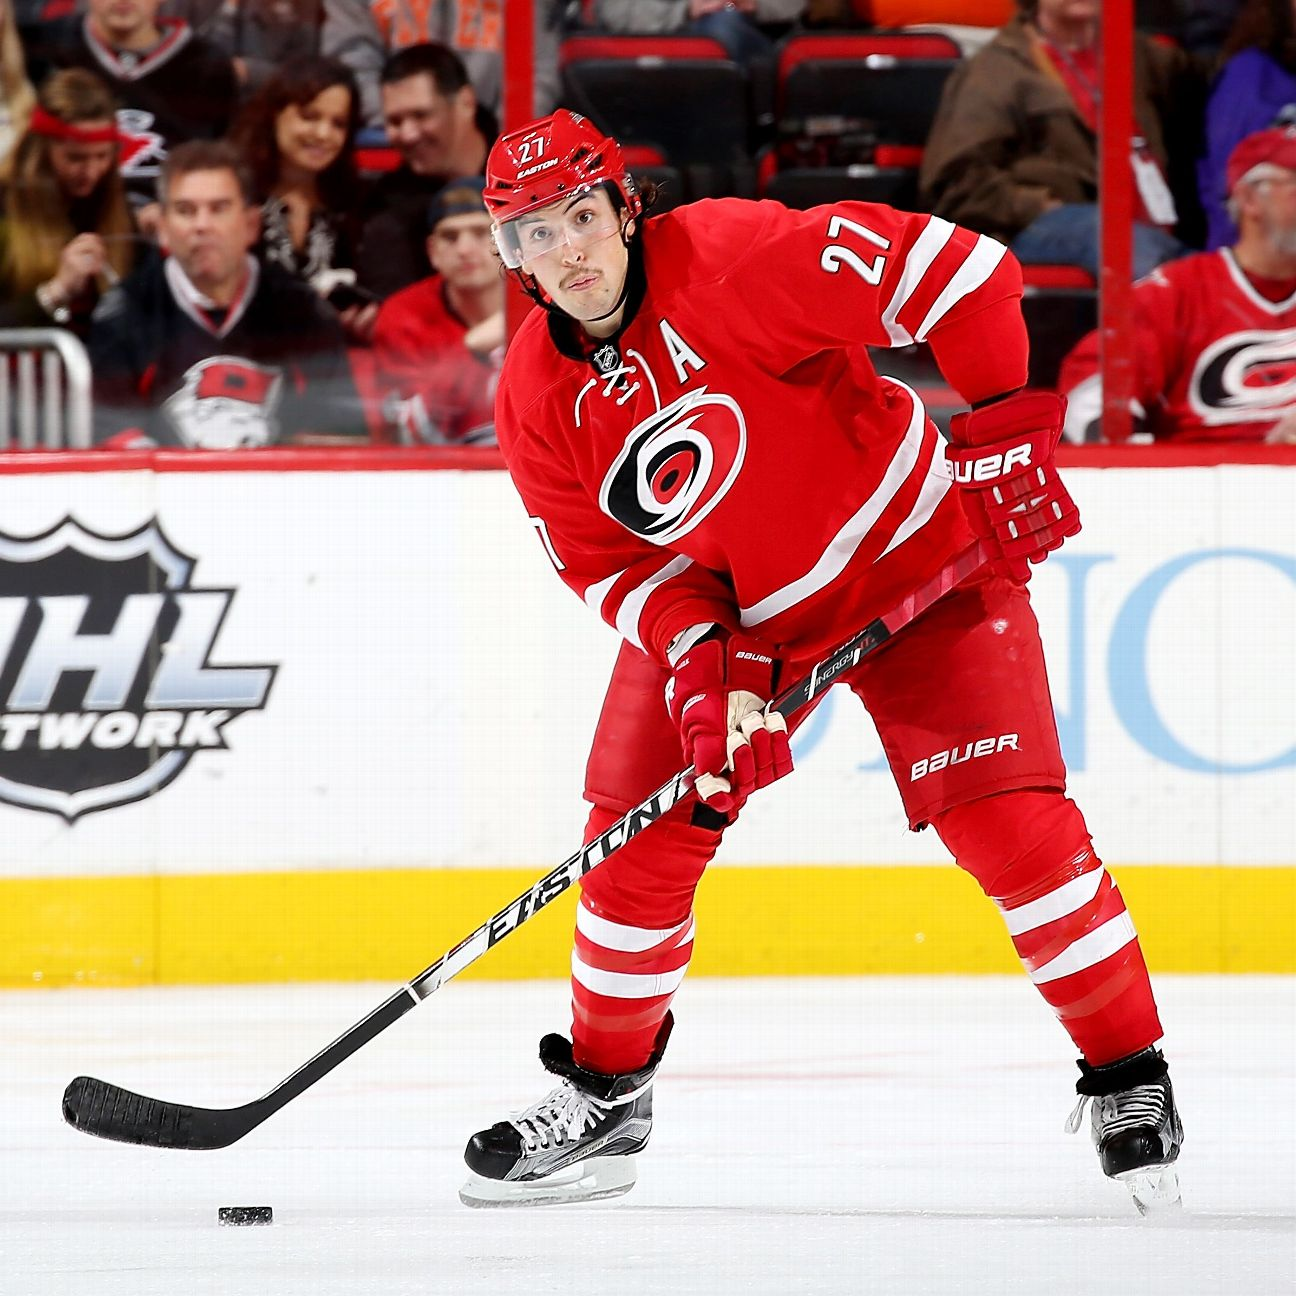 Hurricanes Add All-Star Justin Faulk To Injured List